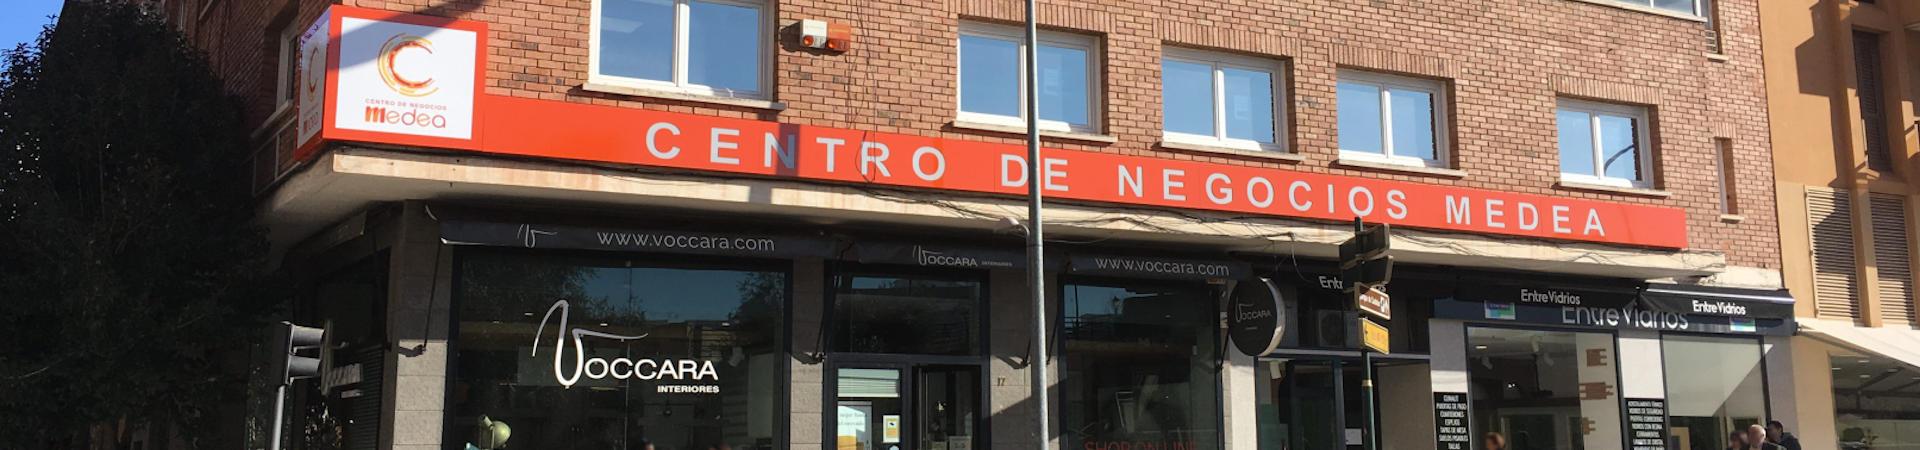 Badajoz_Portada_2